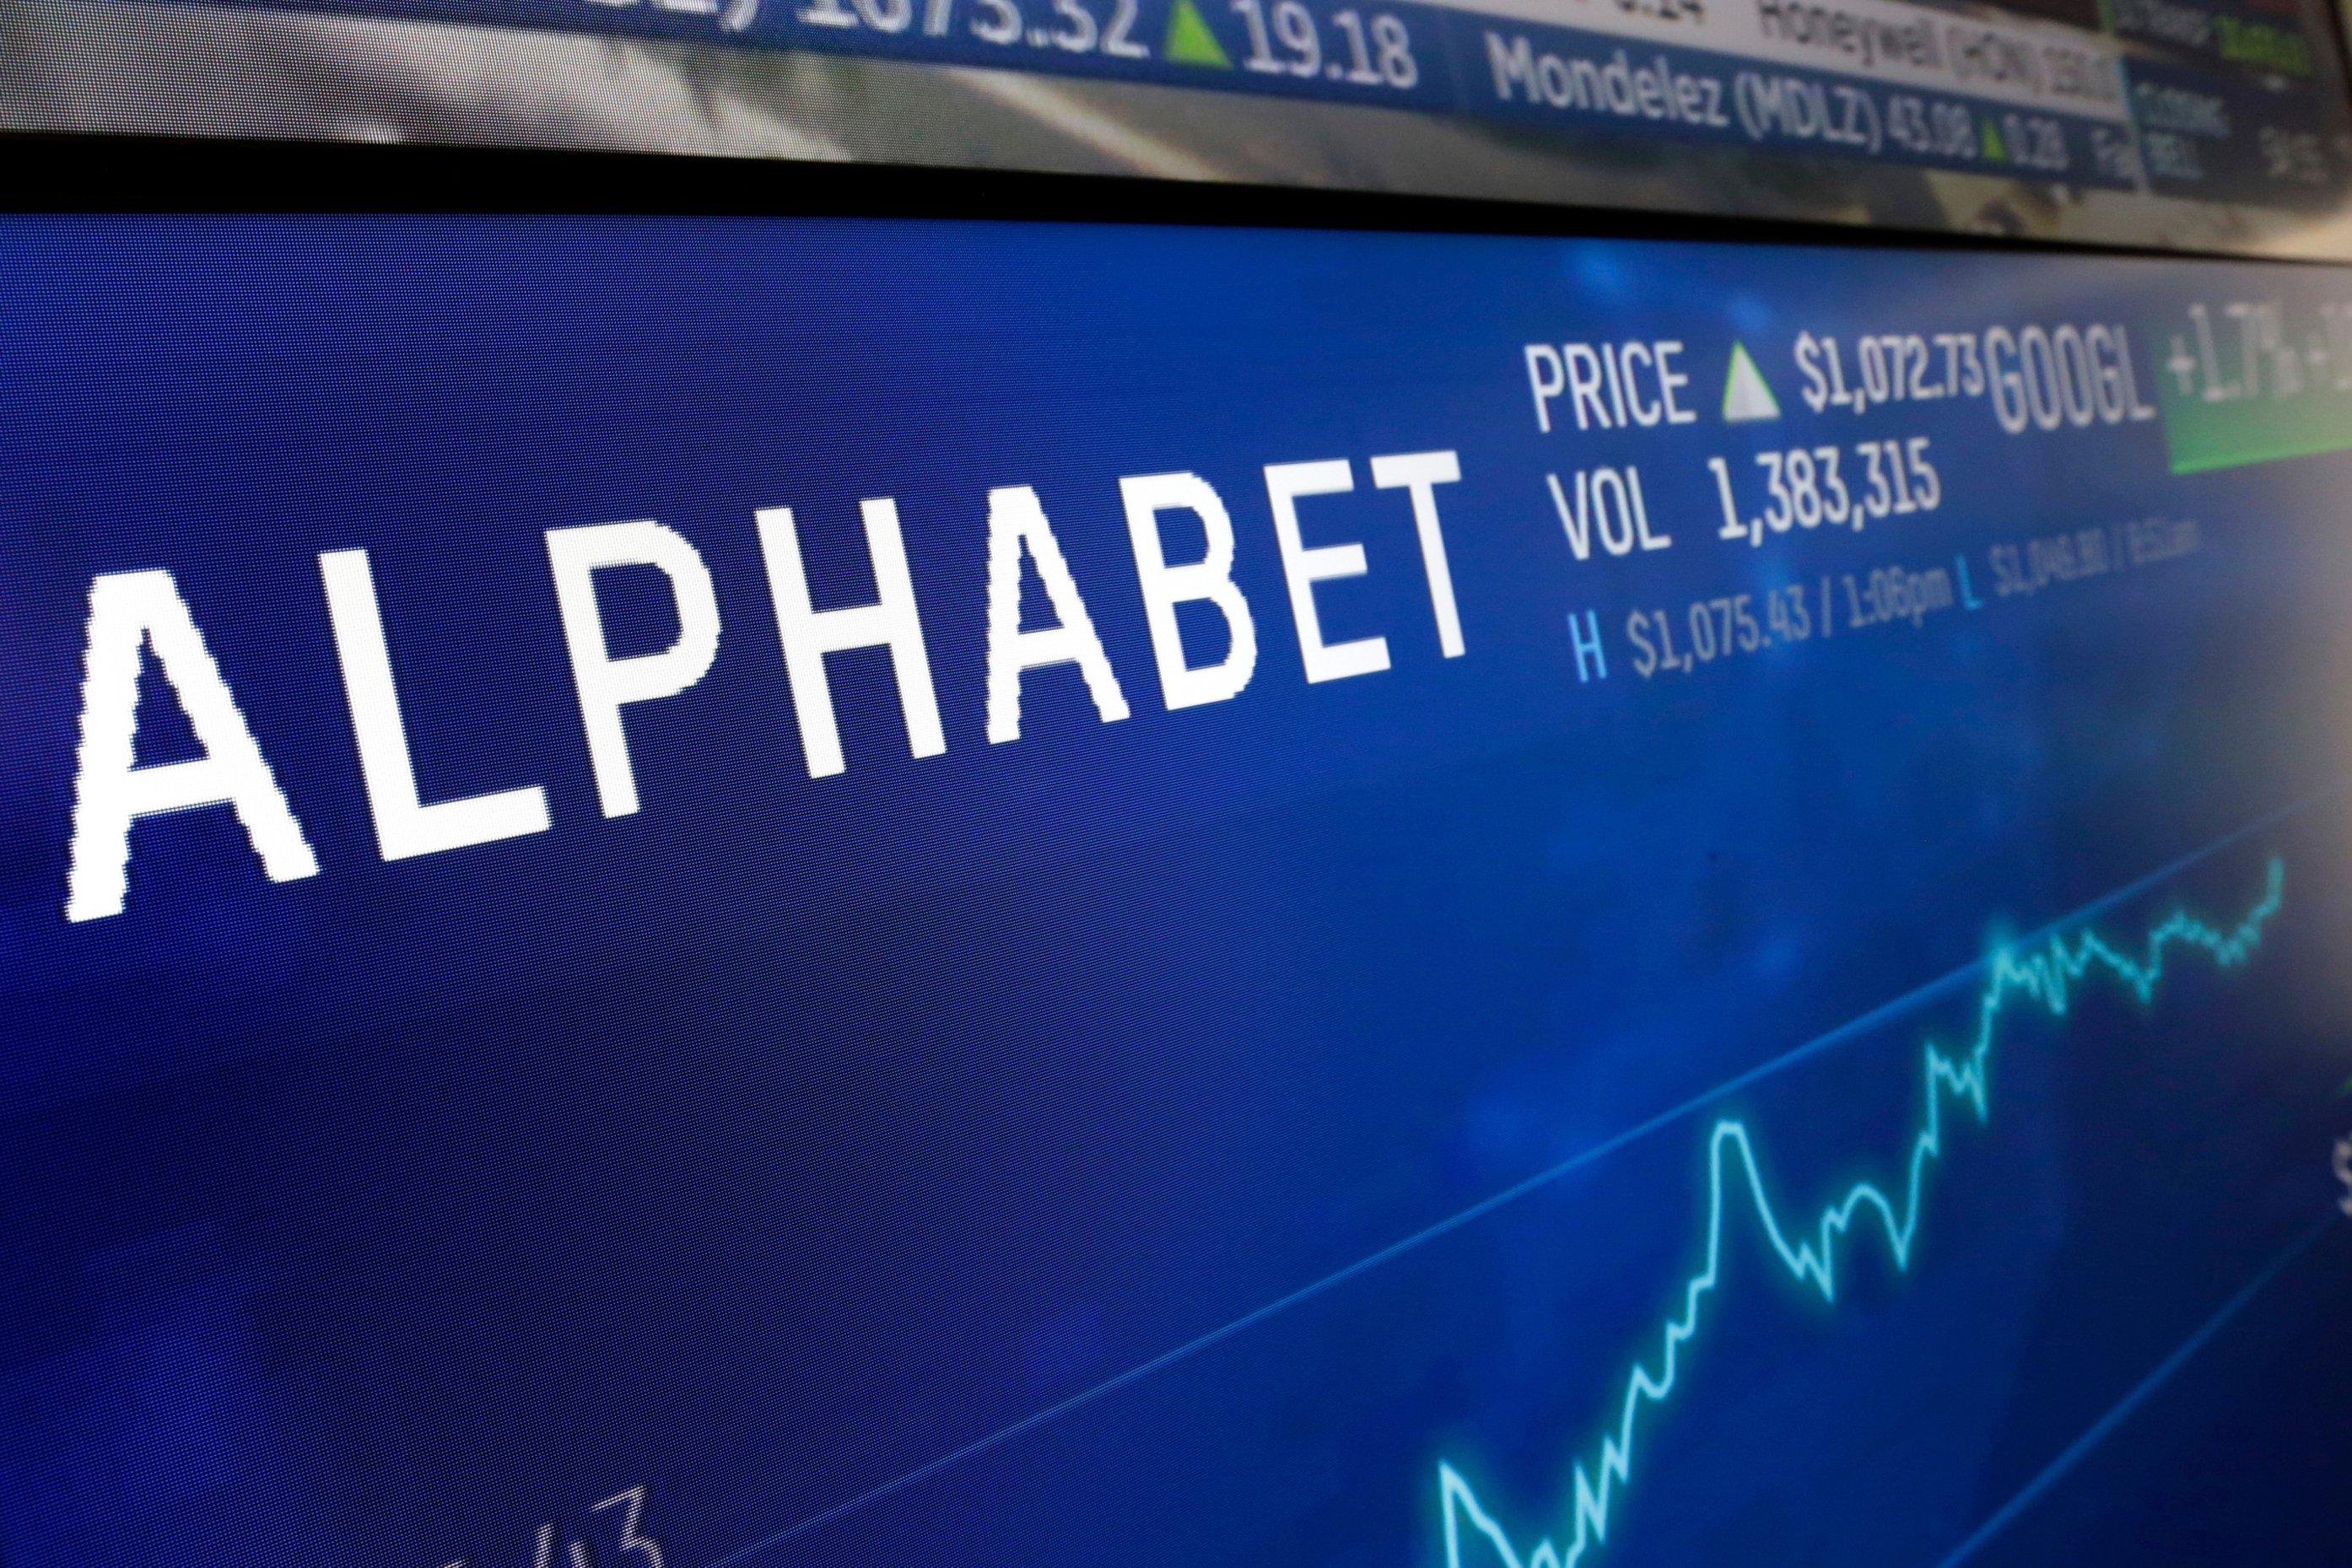 The logo for Alphabet appears on a screen at the Nasdaq MarketSite in New York, U.S., Feb. 14, 2018. (AP Photo)